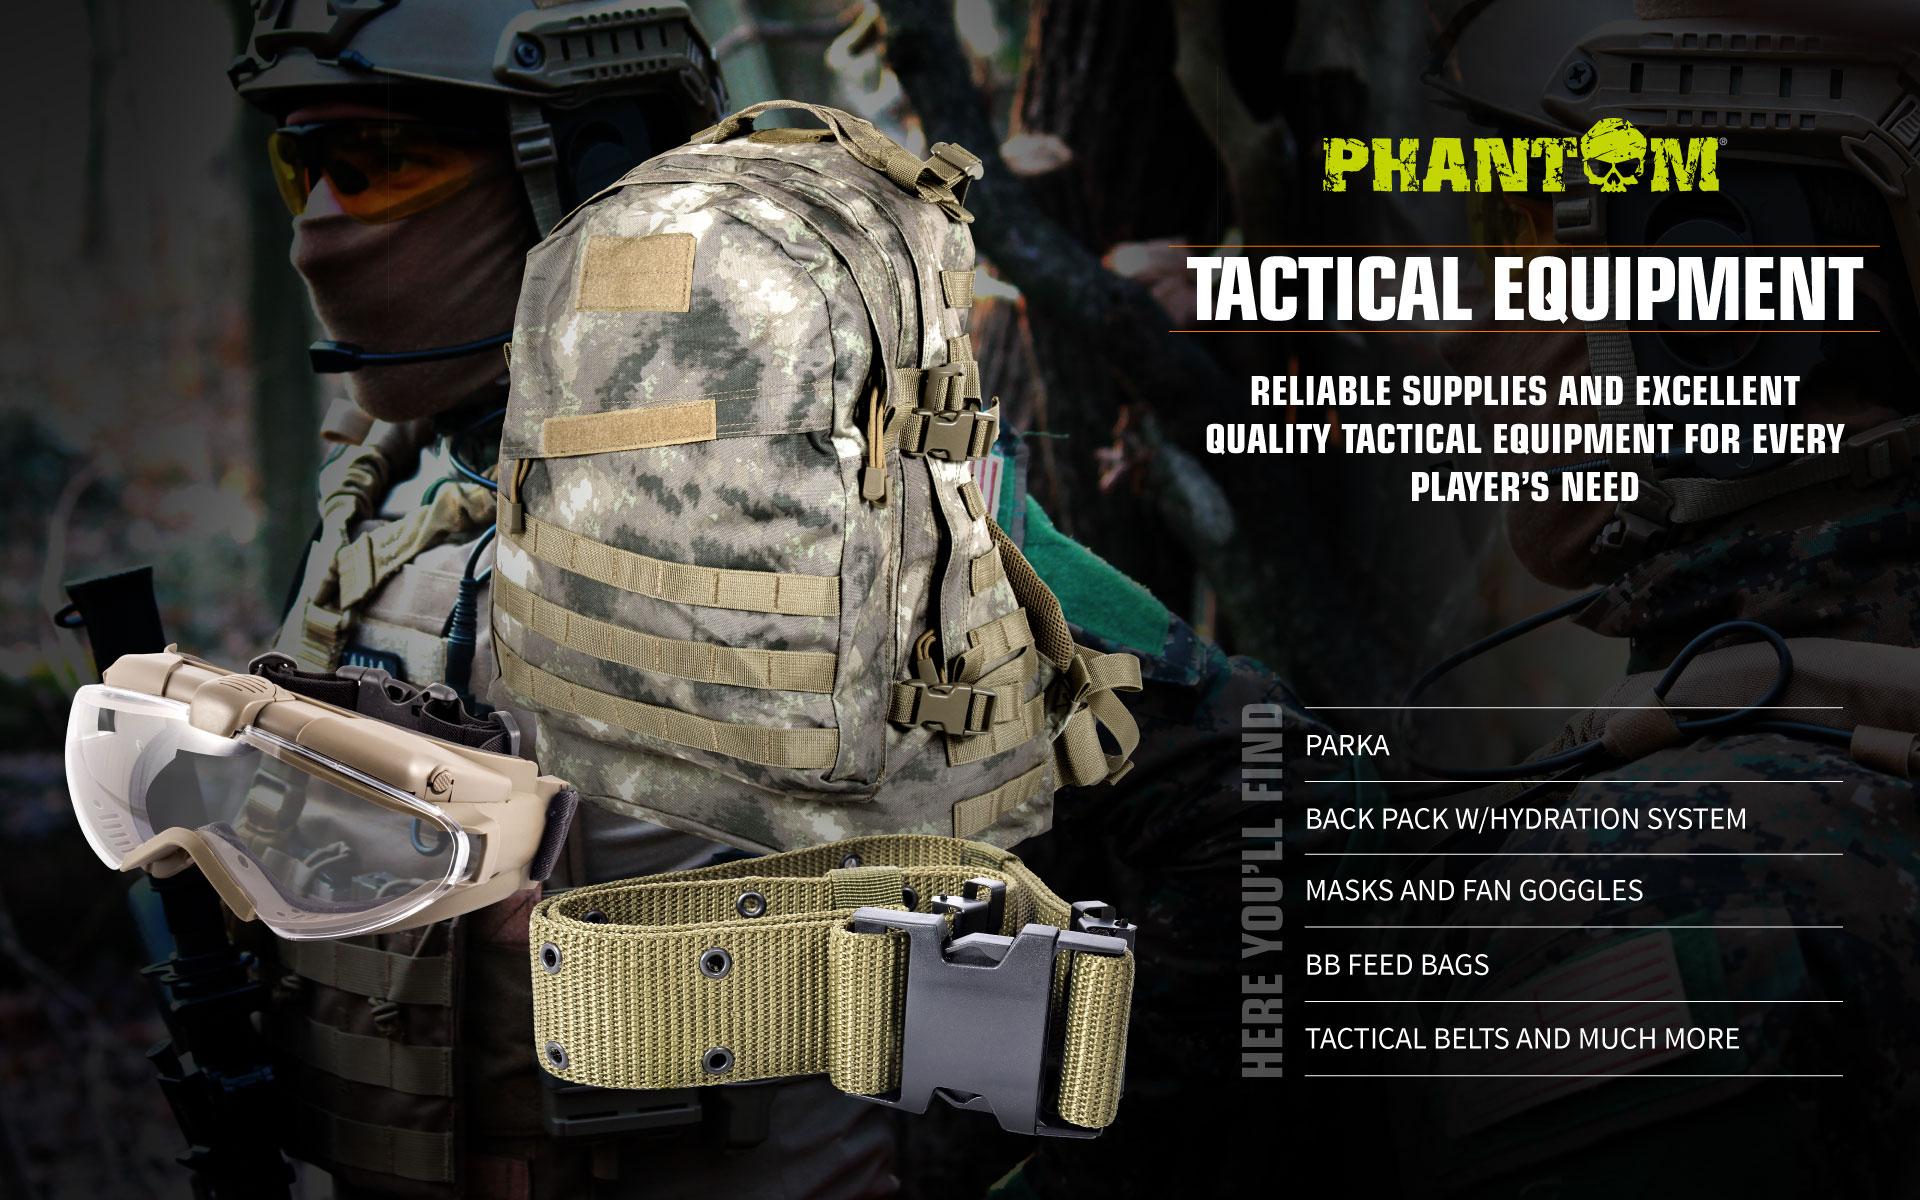 Phantom Tactical Equipment